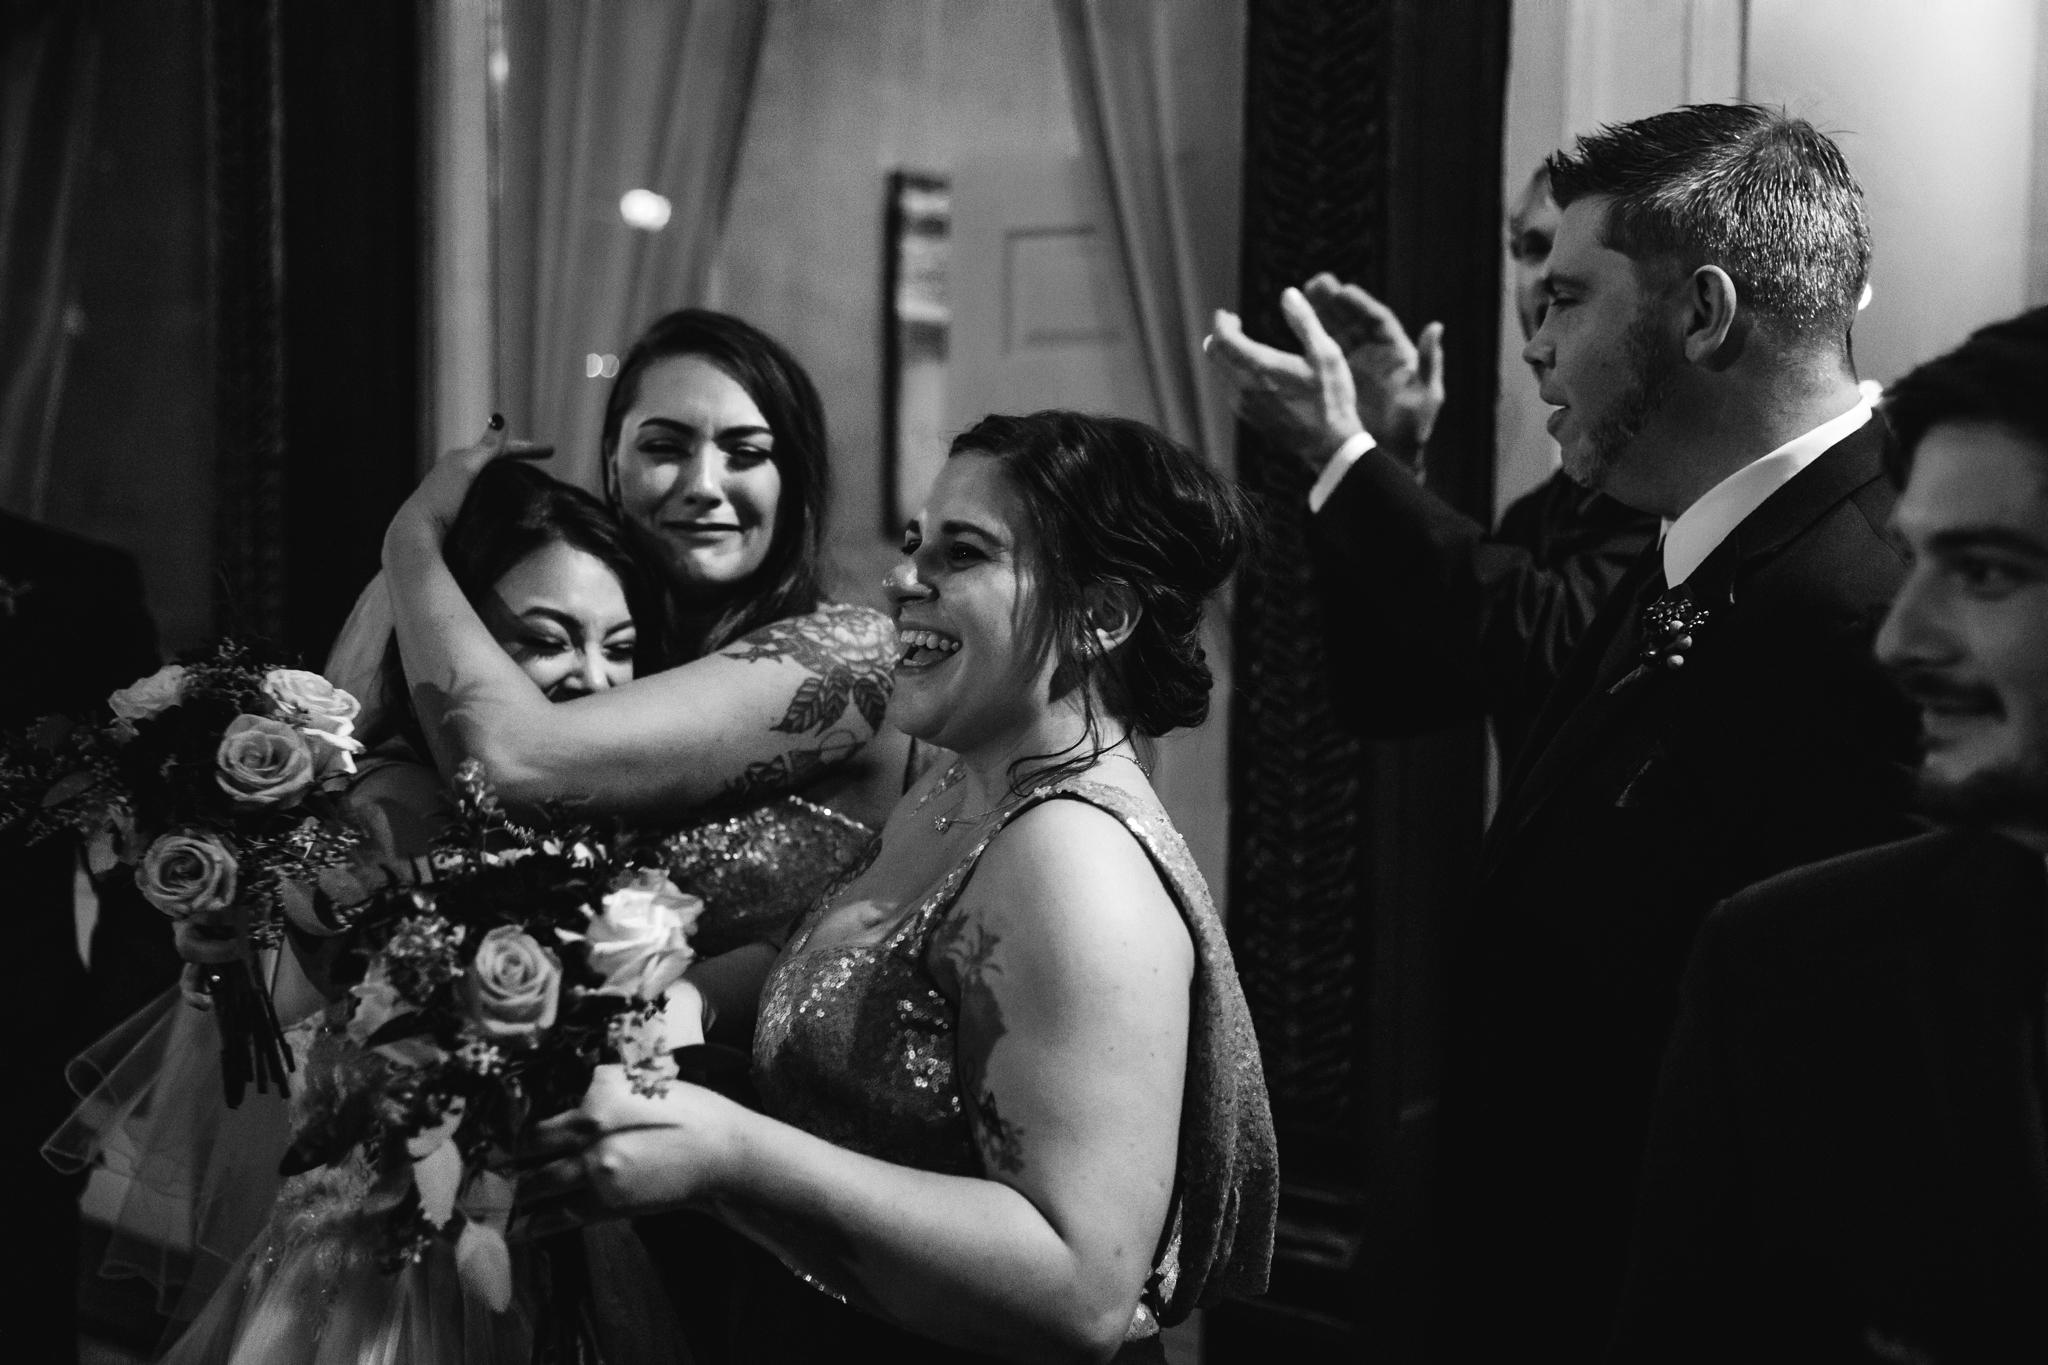 memphis-wedding-photographers-thewarmtharoundyou-ballinese-ballroom (165 of 232).jpg